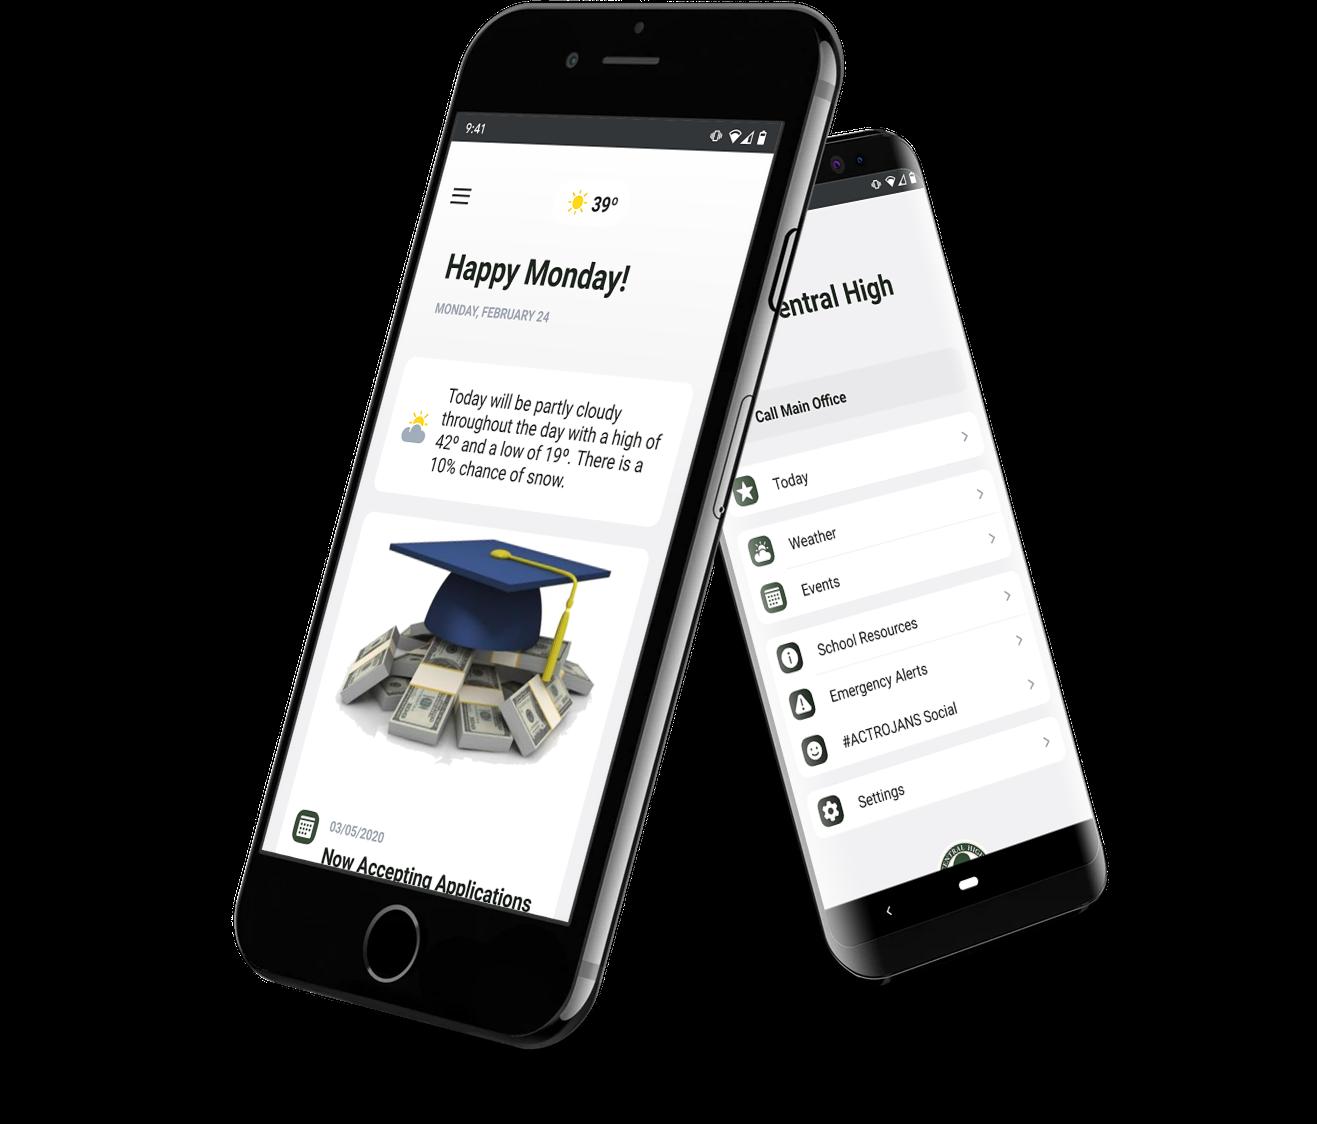 Alpine Media - Mobile app for schools and universities